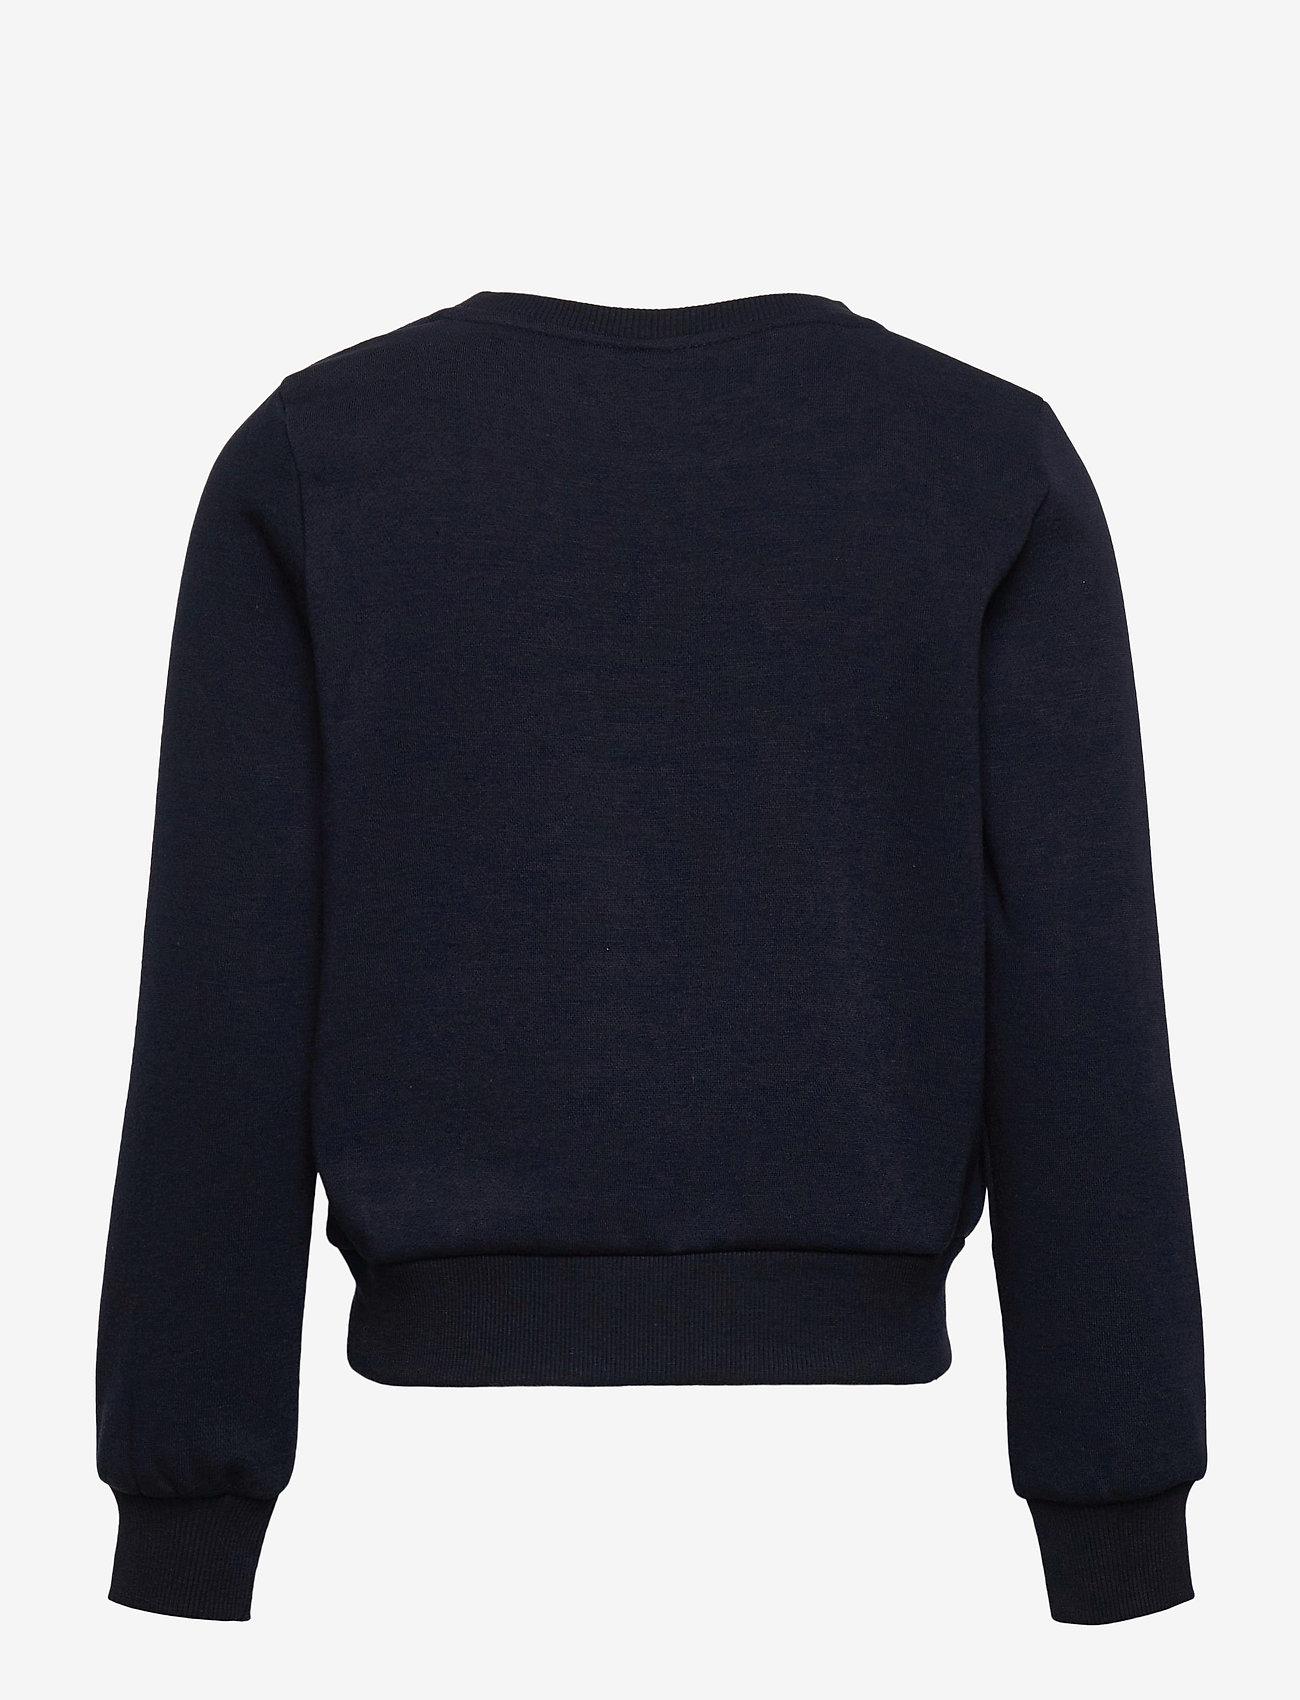 Kids Only - KONLILLIE L/S BOX SWT - sweatshirts - night sky - 1